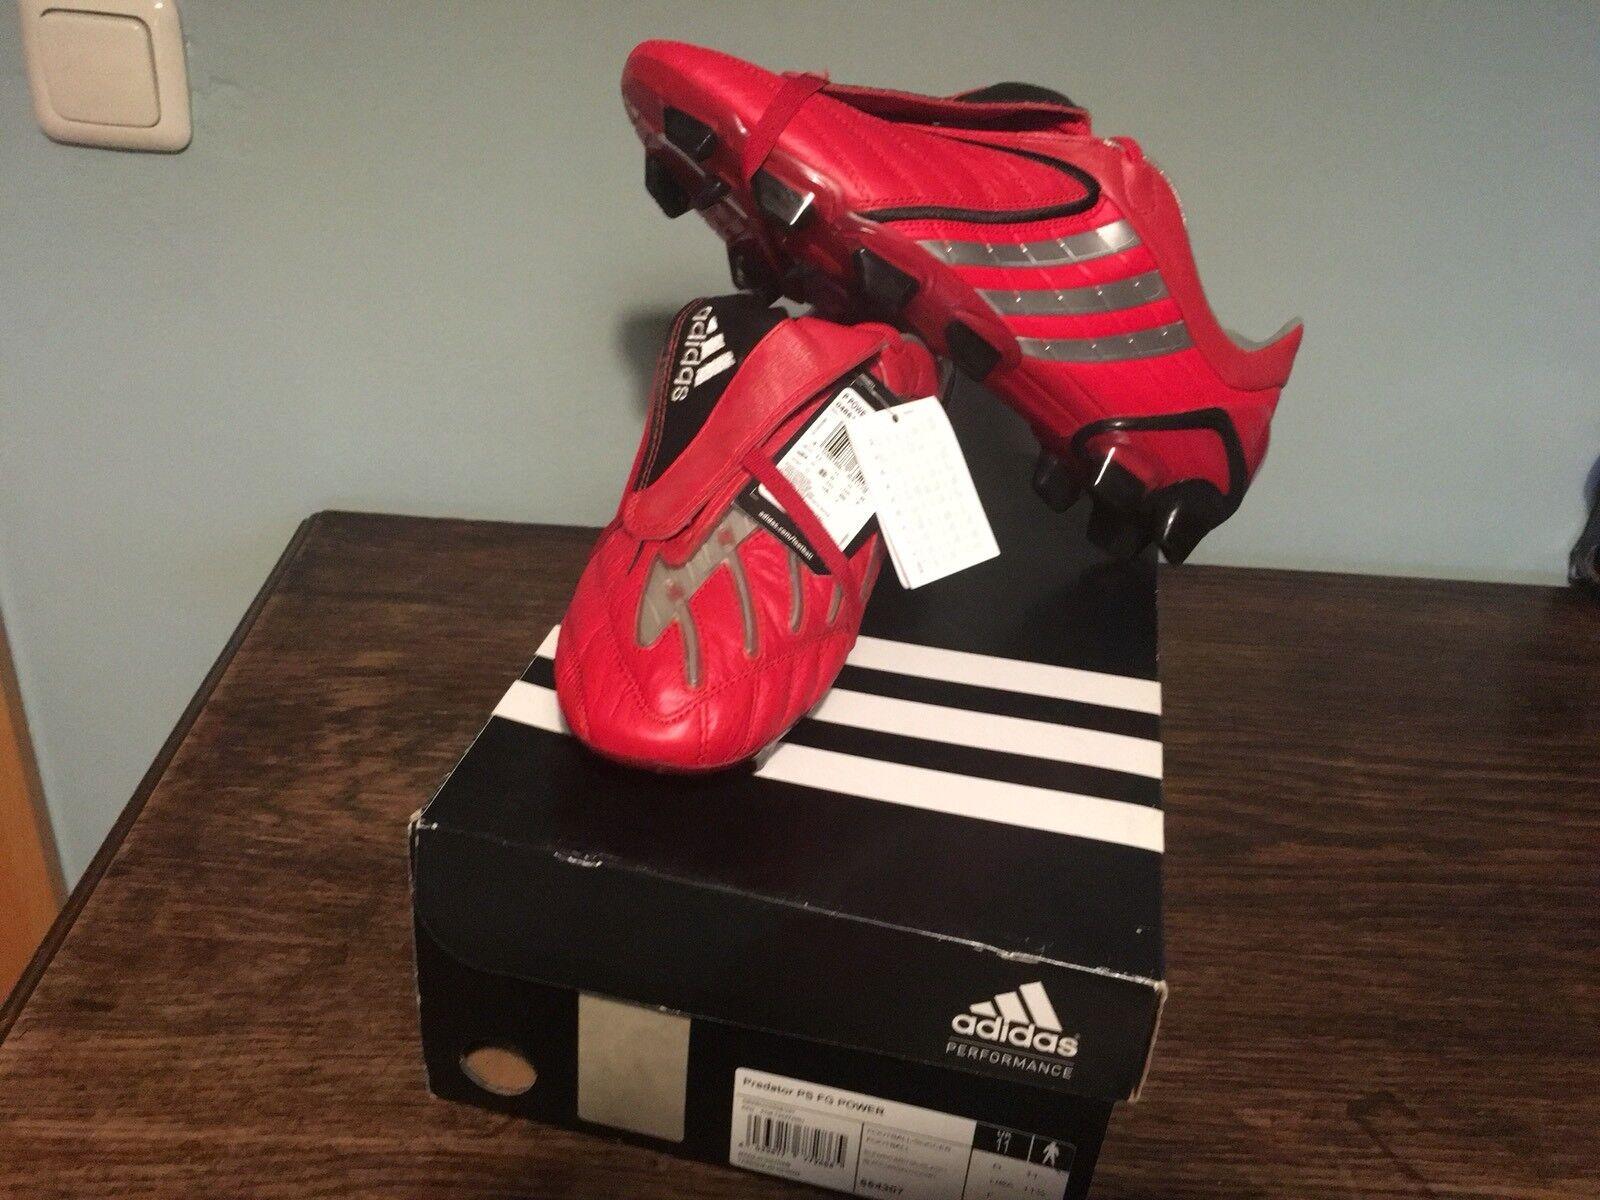 Adidas projoator powerswerve talla 46 11 us 11,5 nuevo New with Box